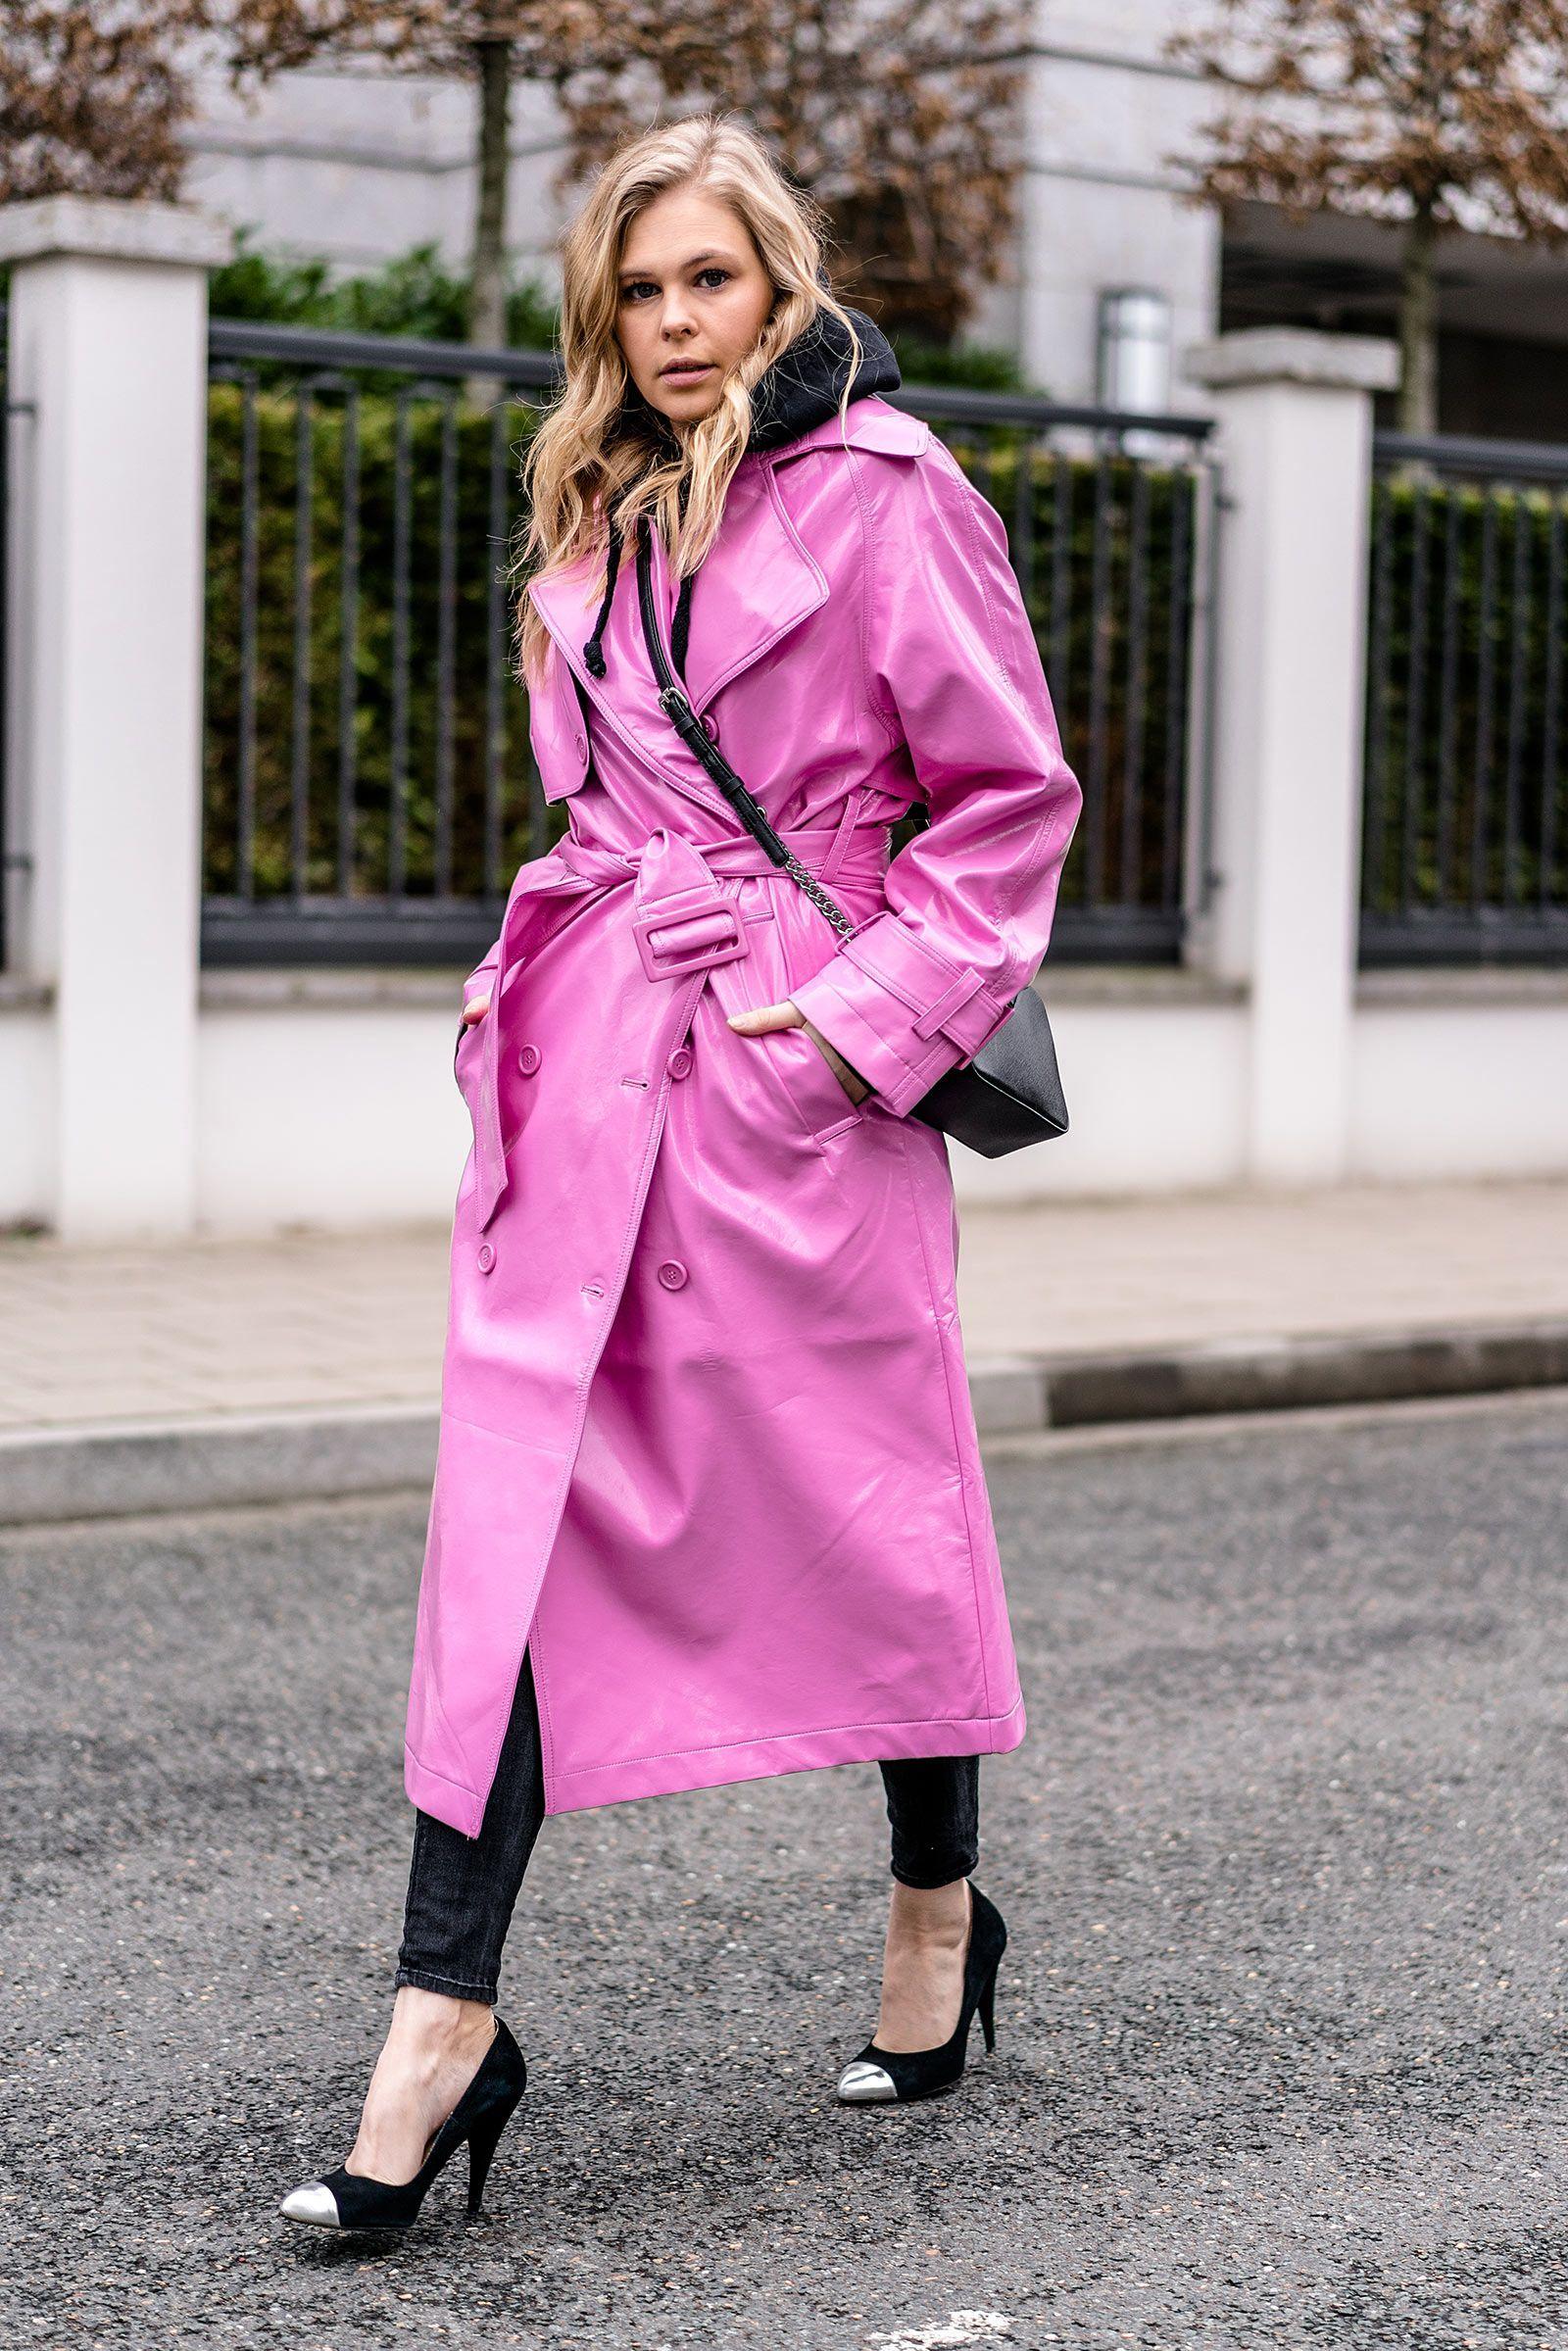 6001c3bc736f72 em Outfit  em   Vinyl  b Trenchcoat  b  in Pink mit schwarzen Basics ...